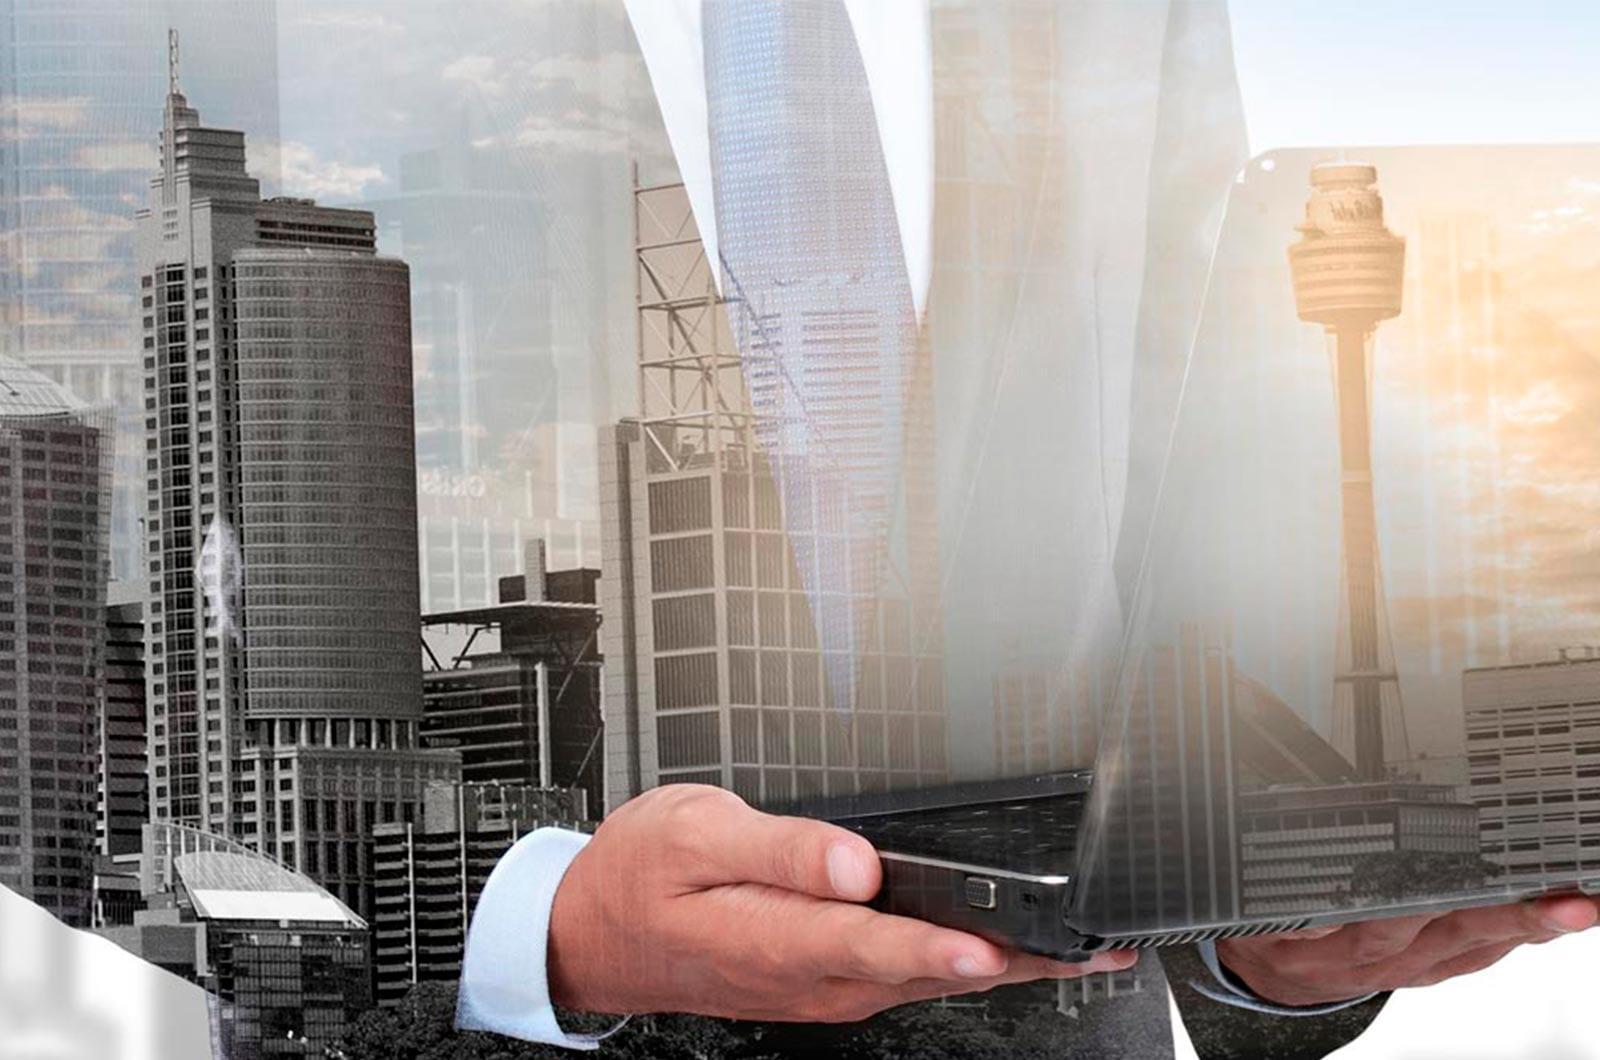 Commercial Real Estate Trends 2016 | Commercial Real Estate Market Trends